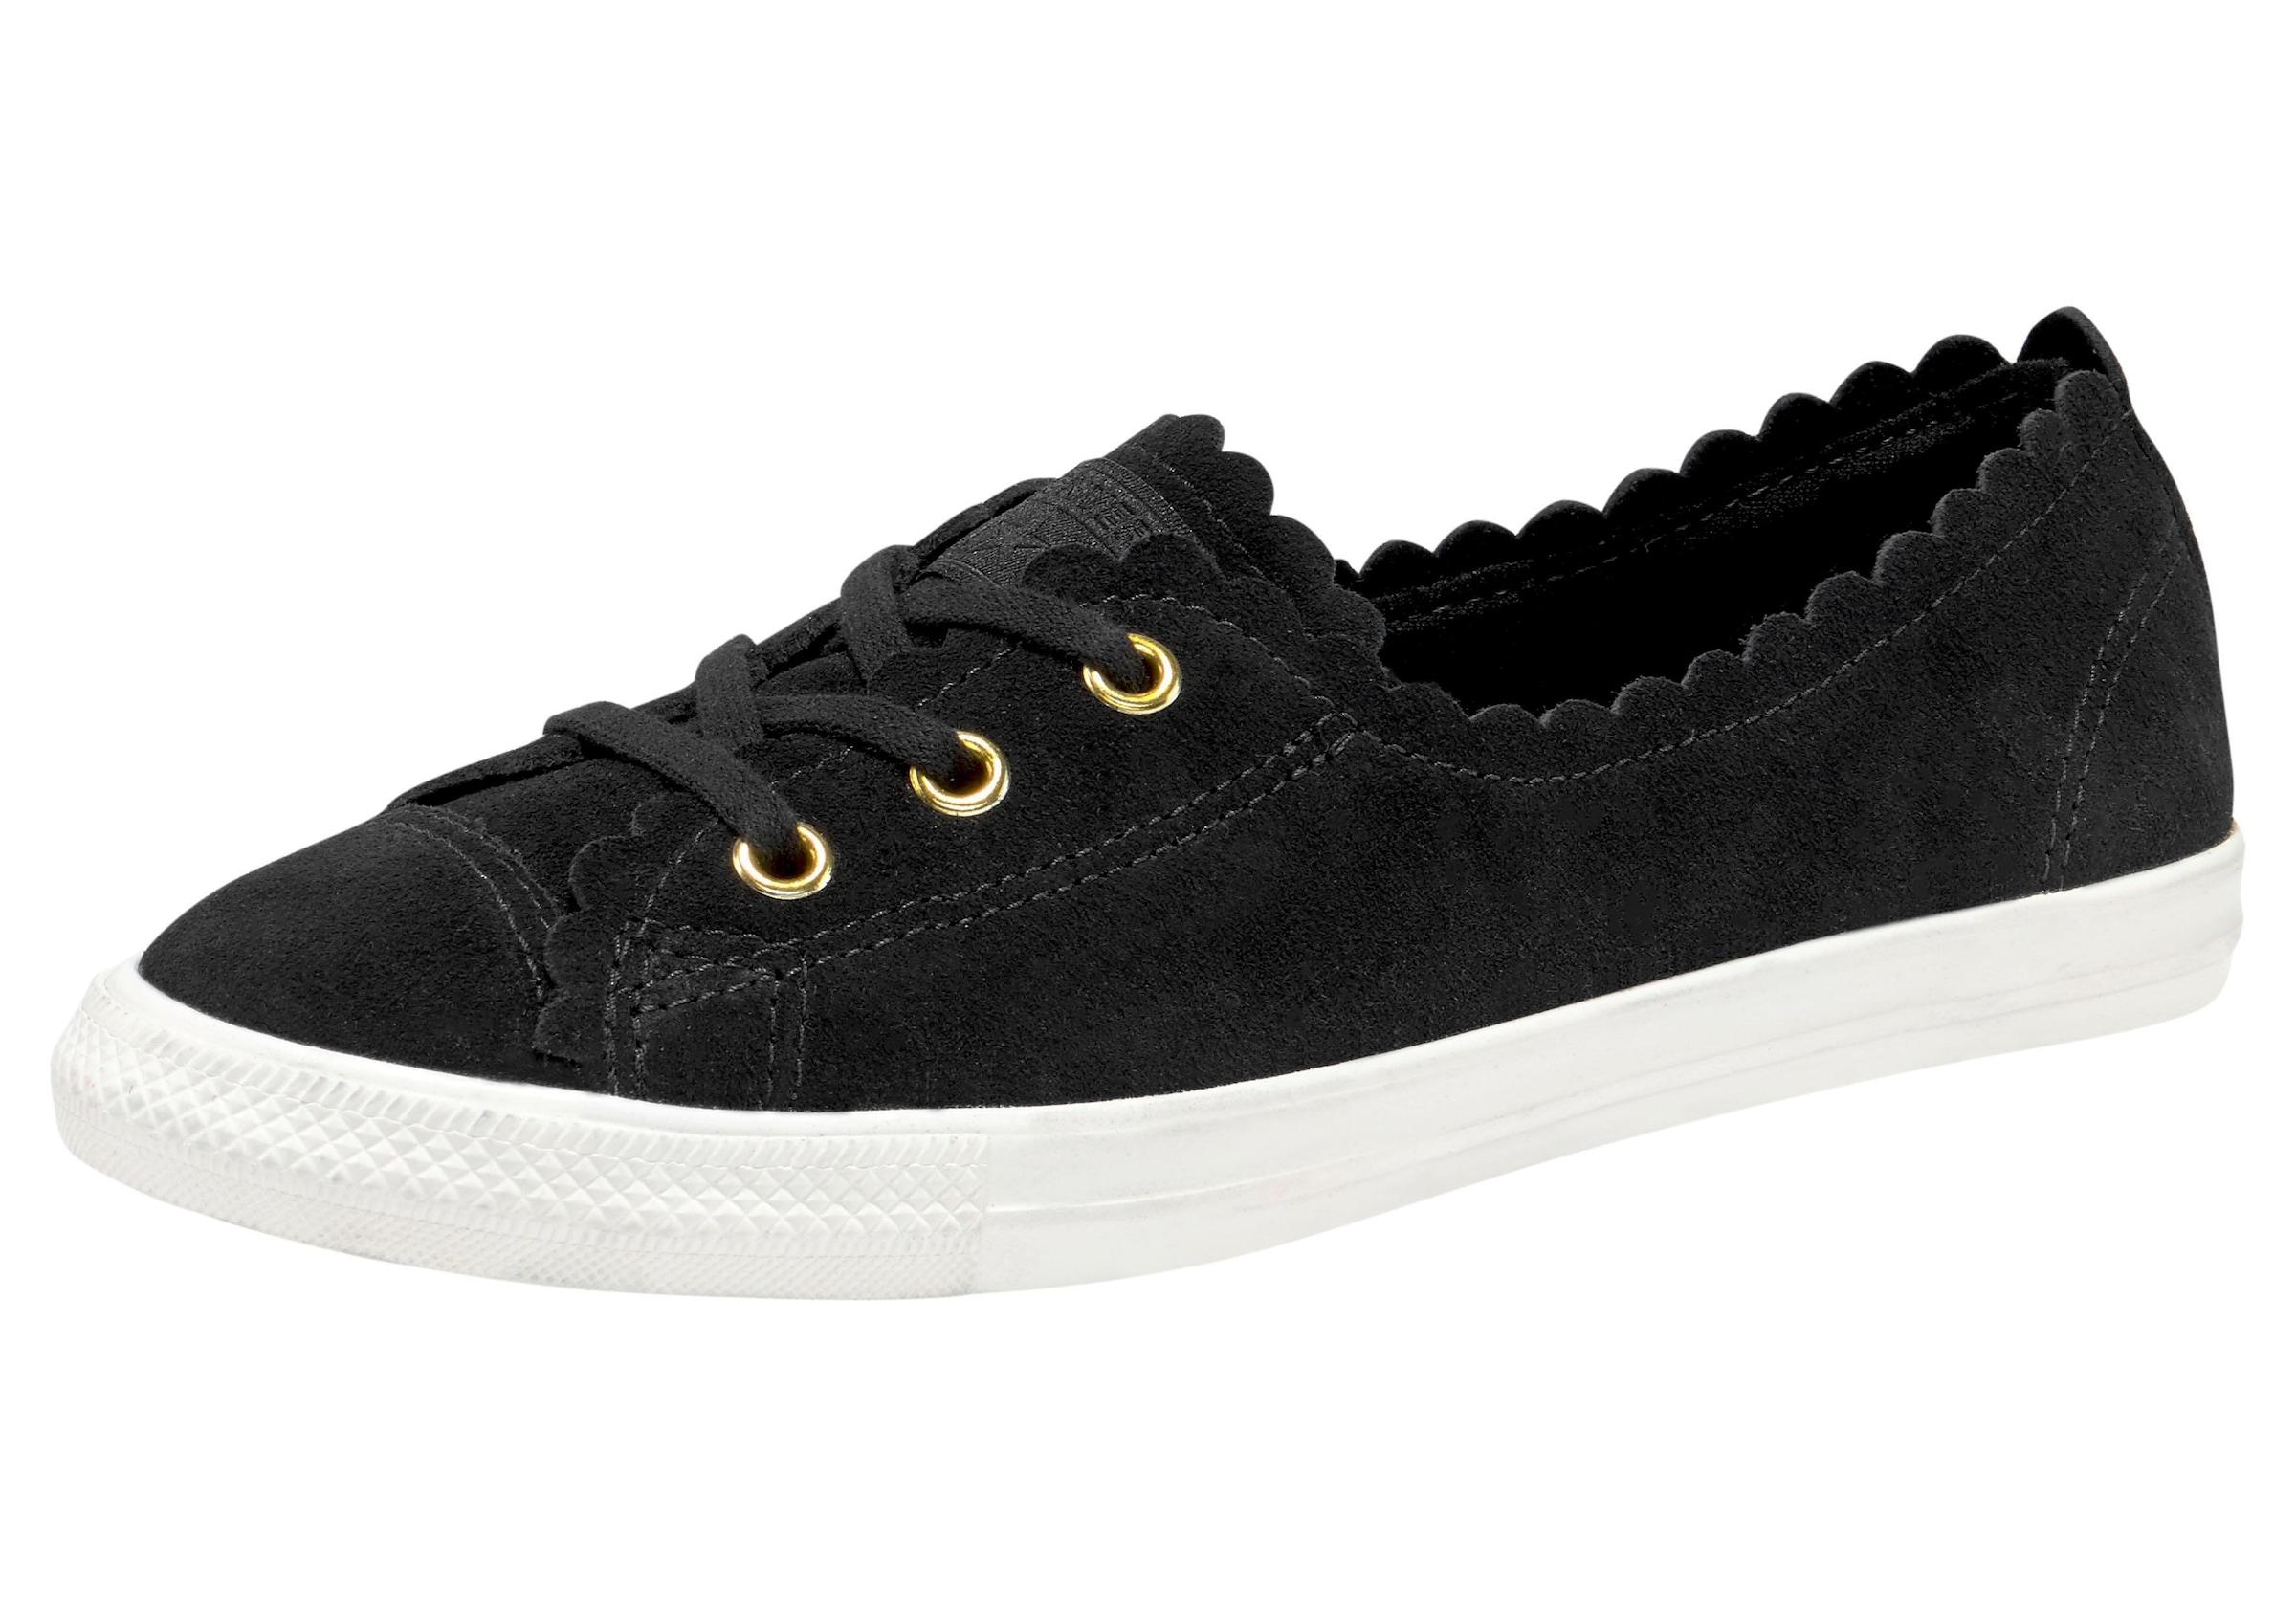 Converse Sneaker »Chuck Taylor All Star Ballet Lace Ox Seasonal« online kaufen | BAUR